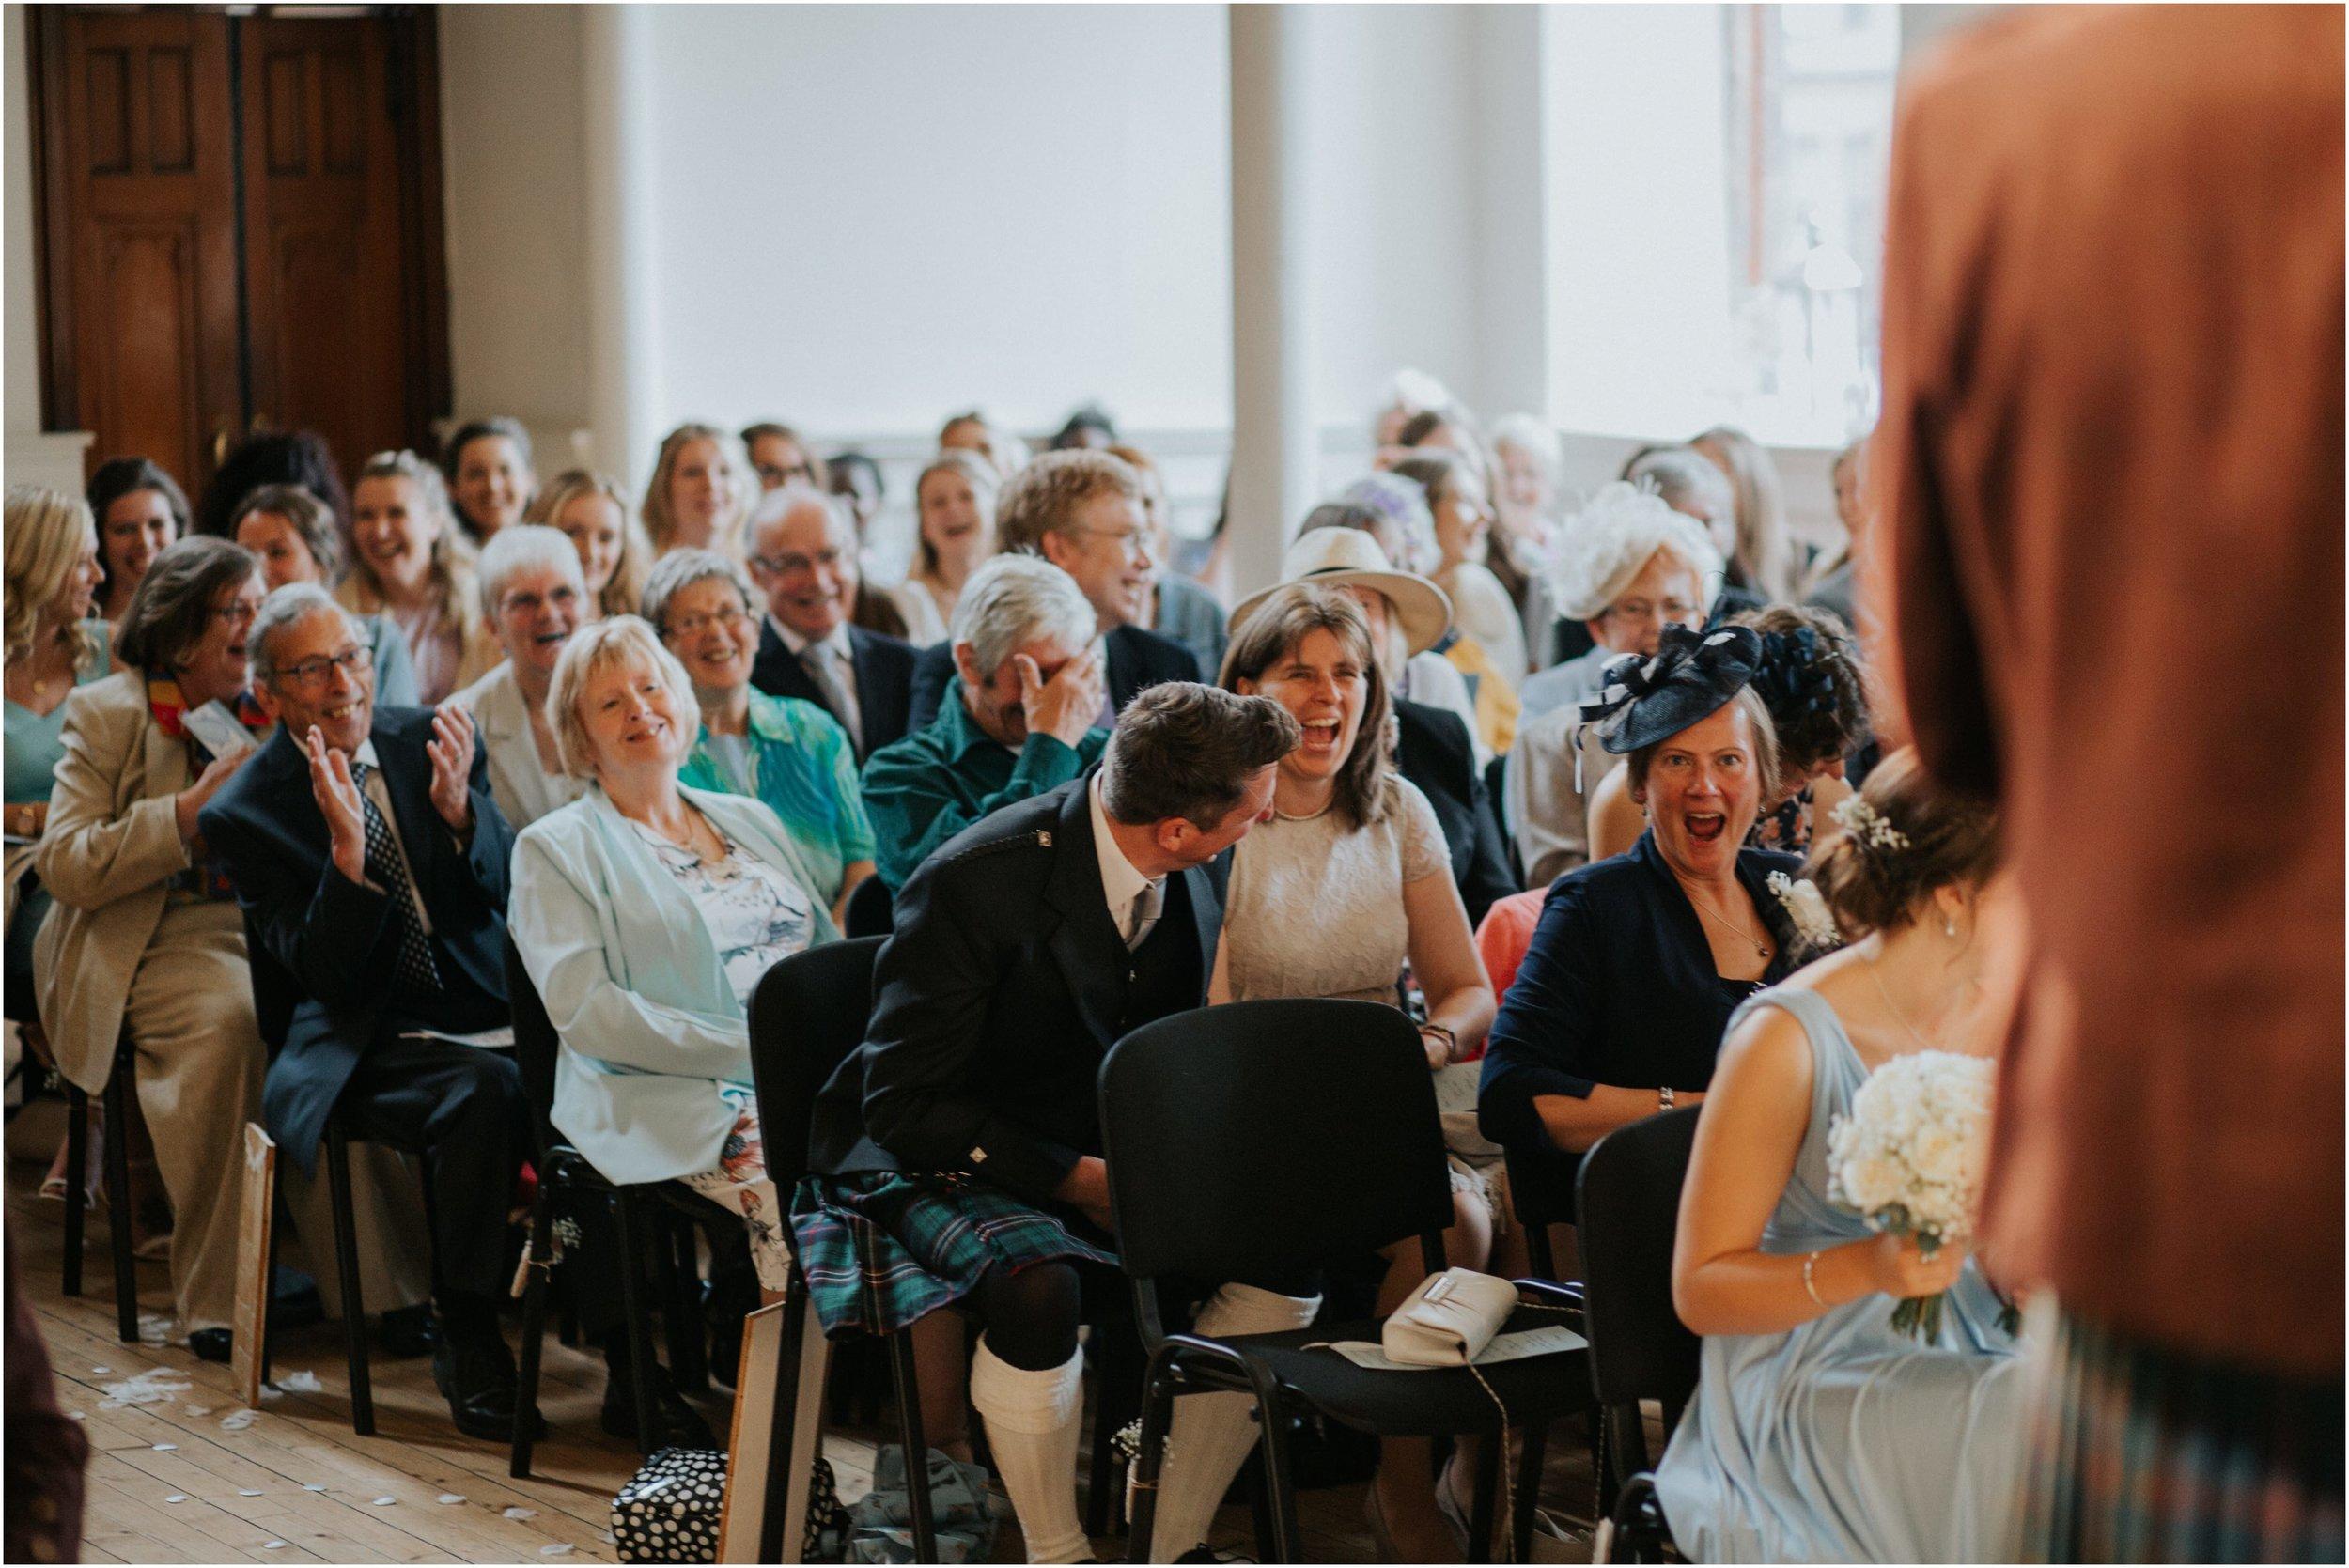 Photography 78 - Glasgow Wedding Photographer - Year in Reveiw_0089.jpg